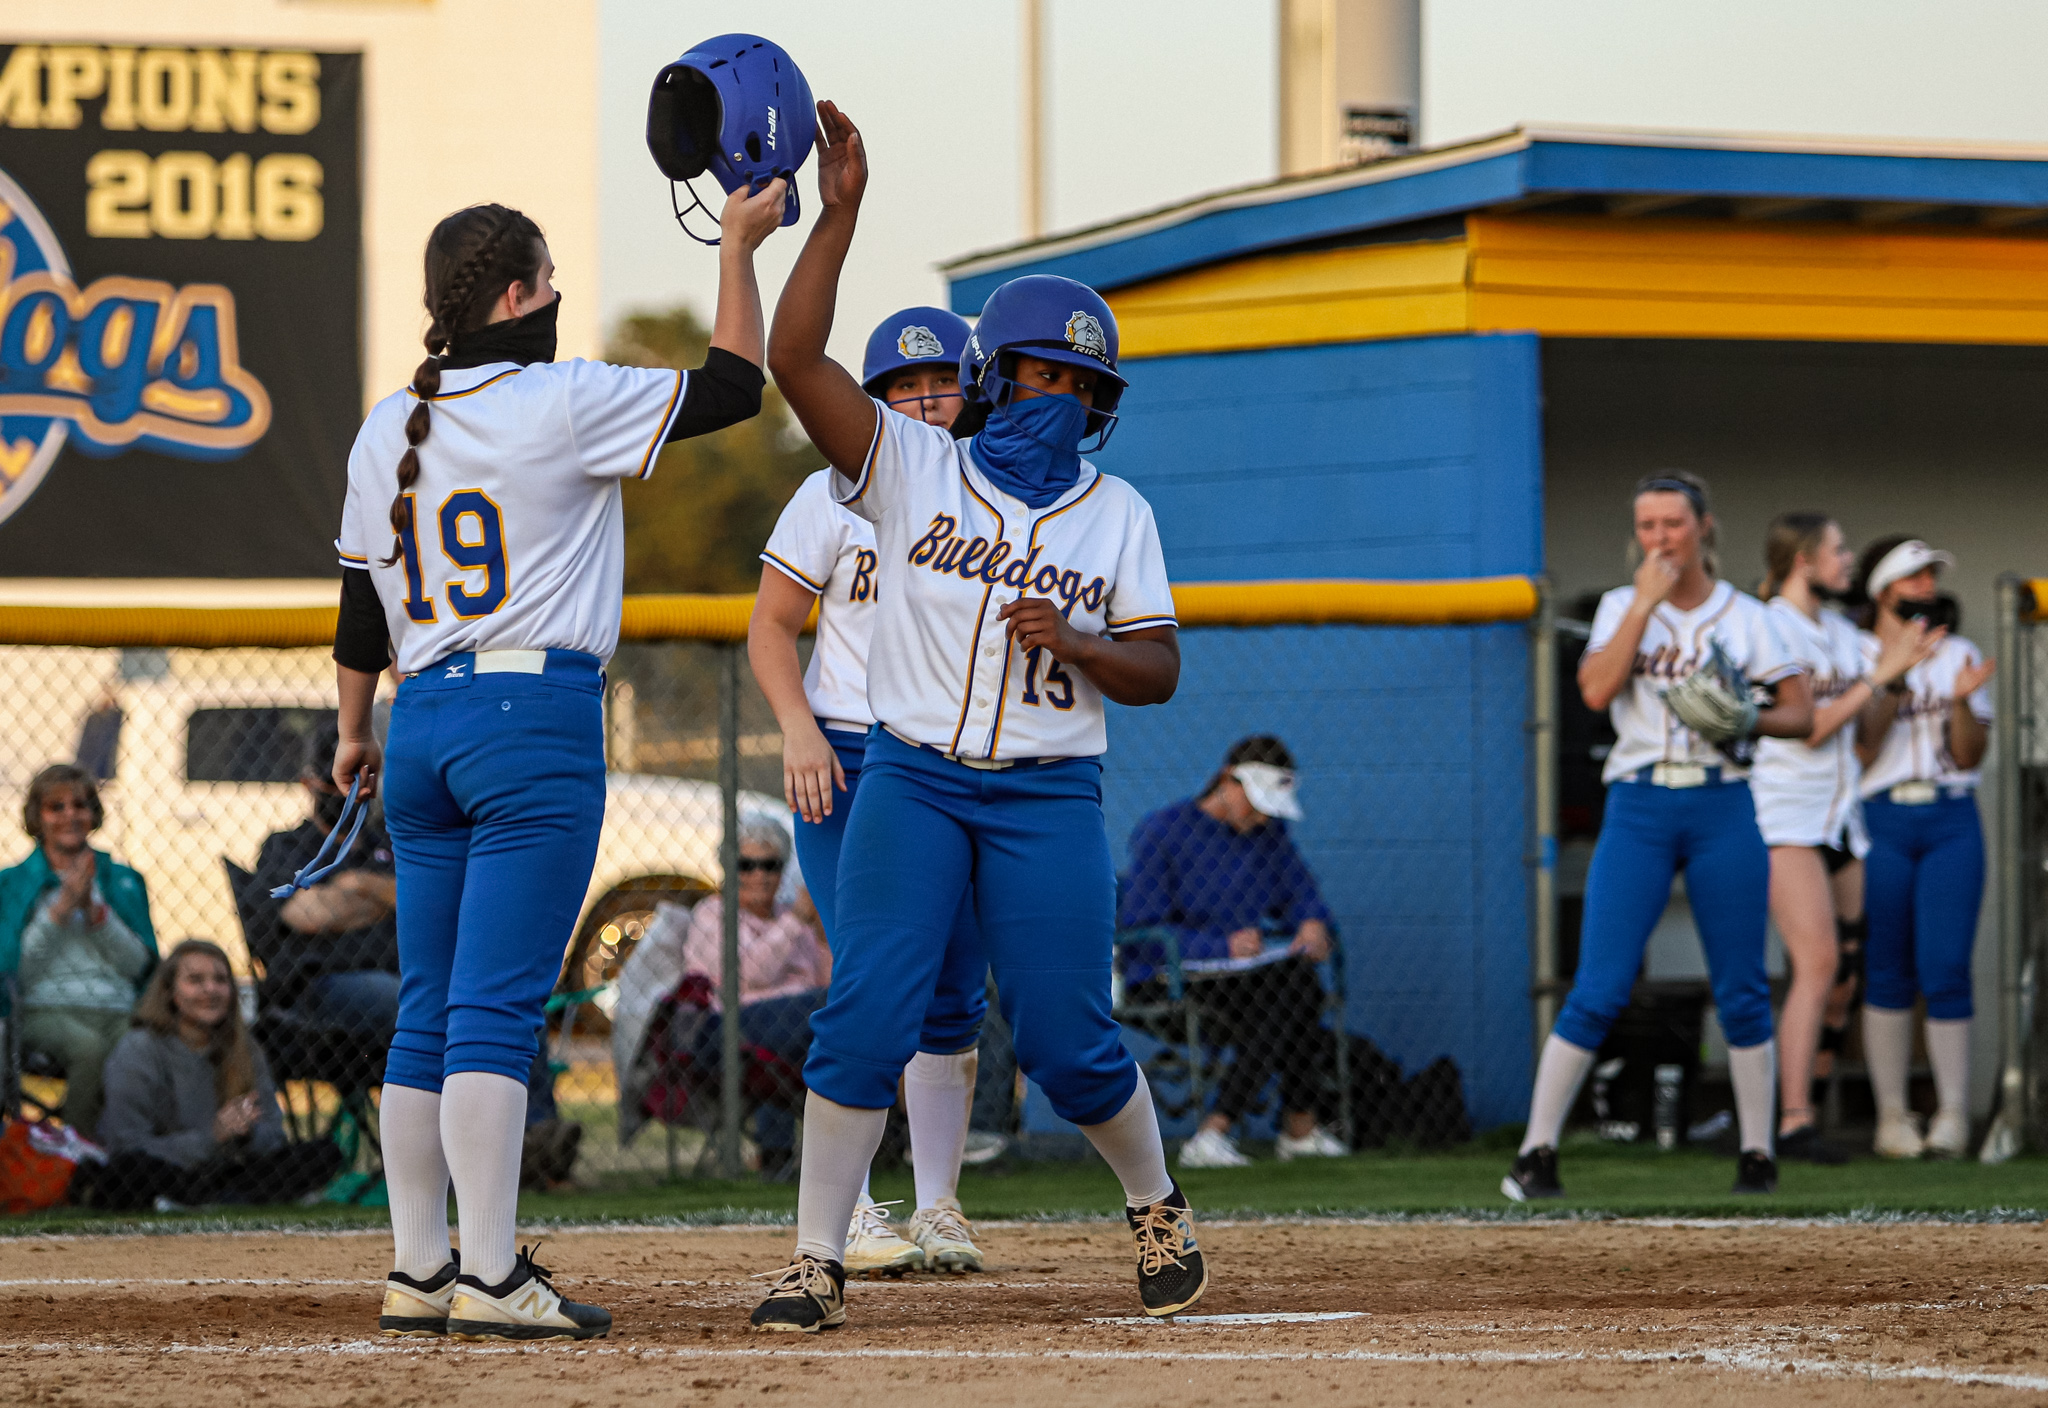 Softball: Princeton Takes Down Rosewood (PHOTO GALLERY)